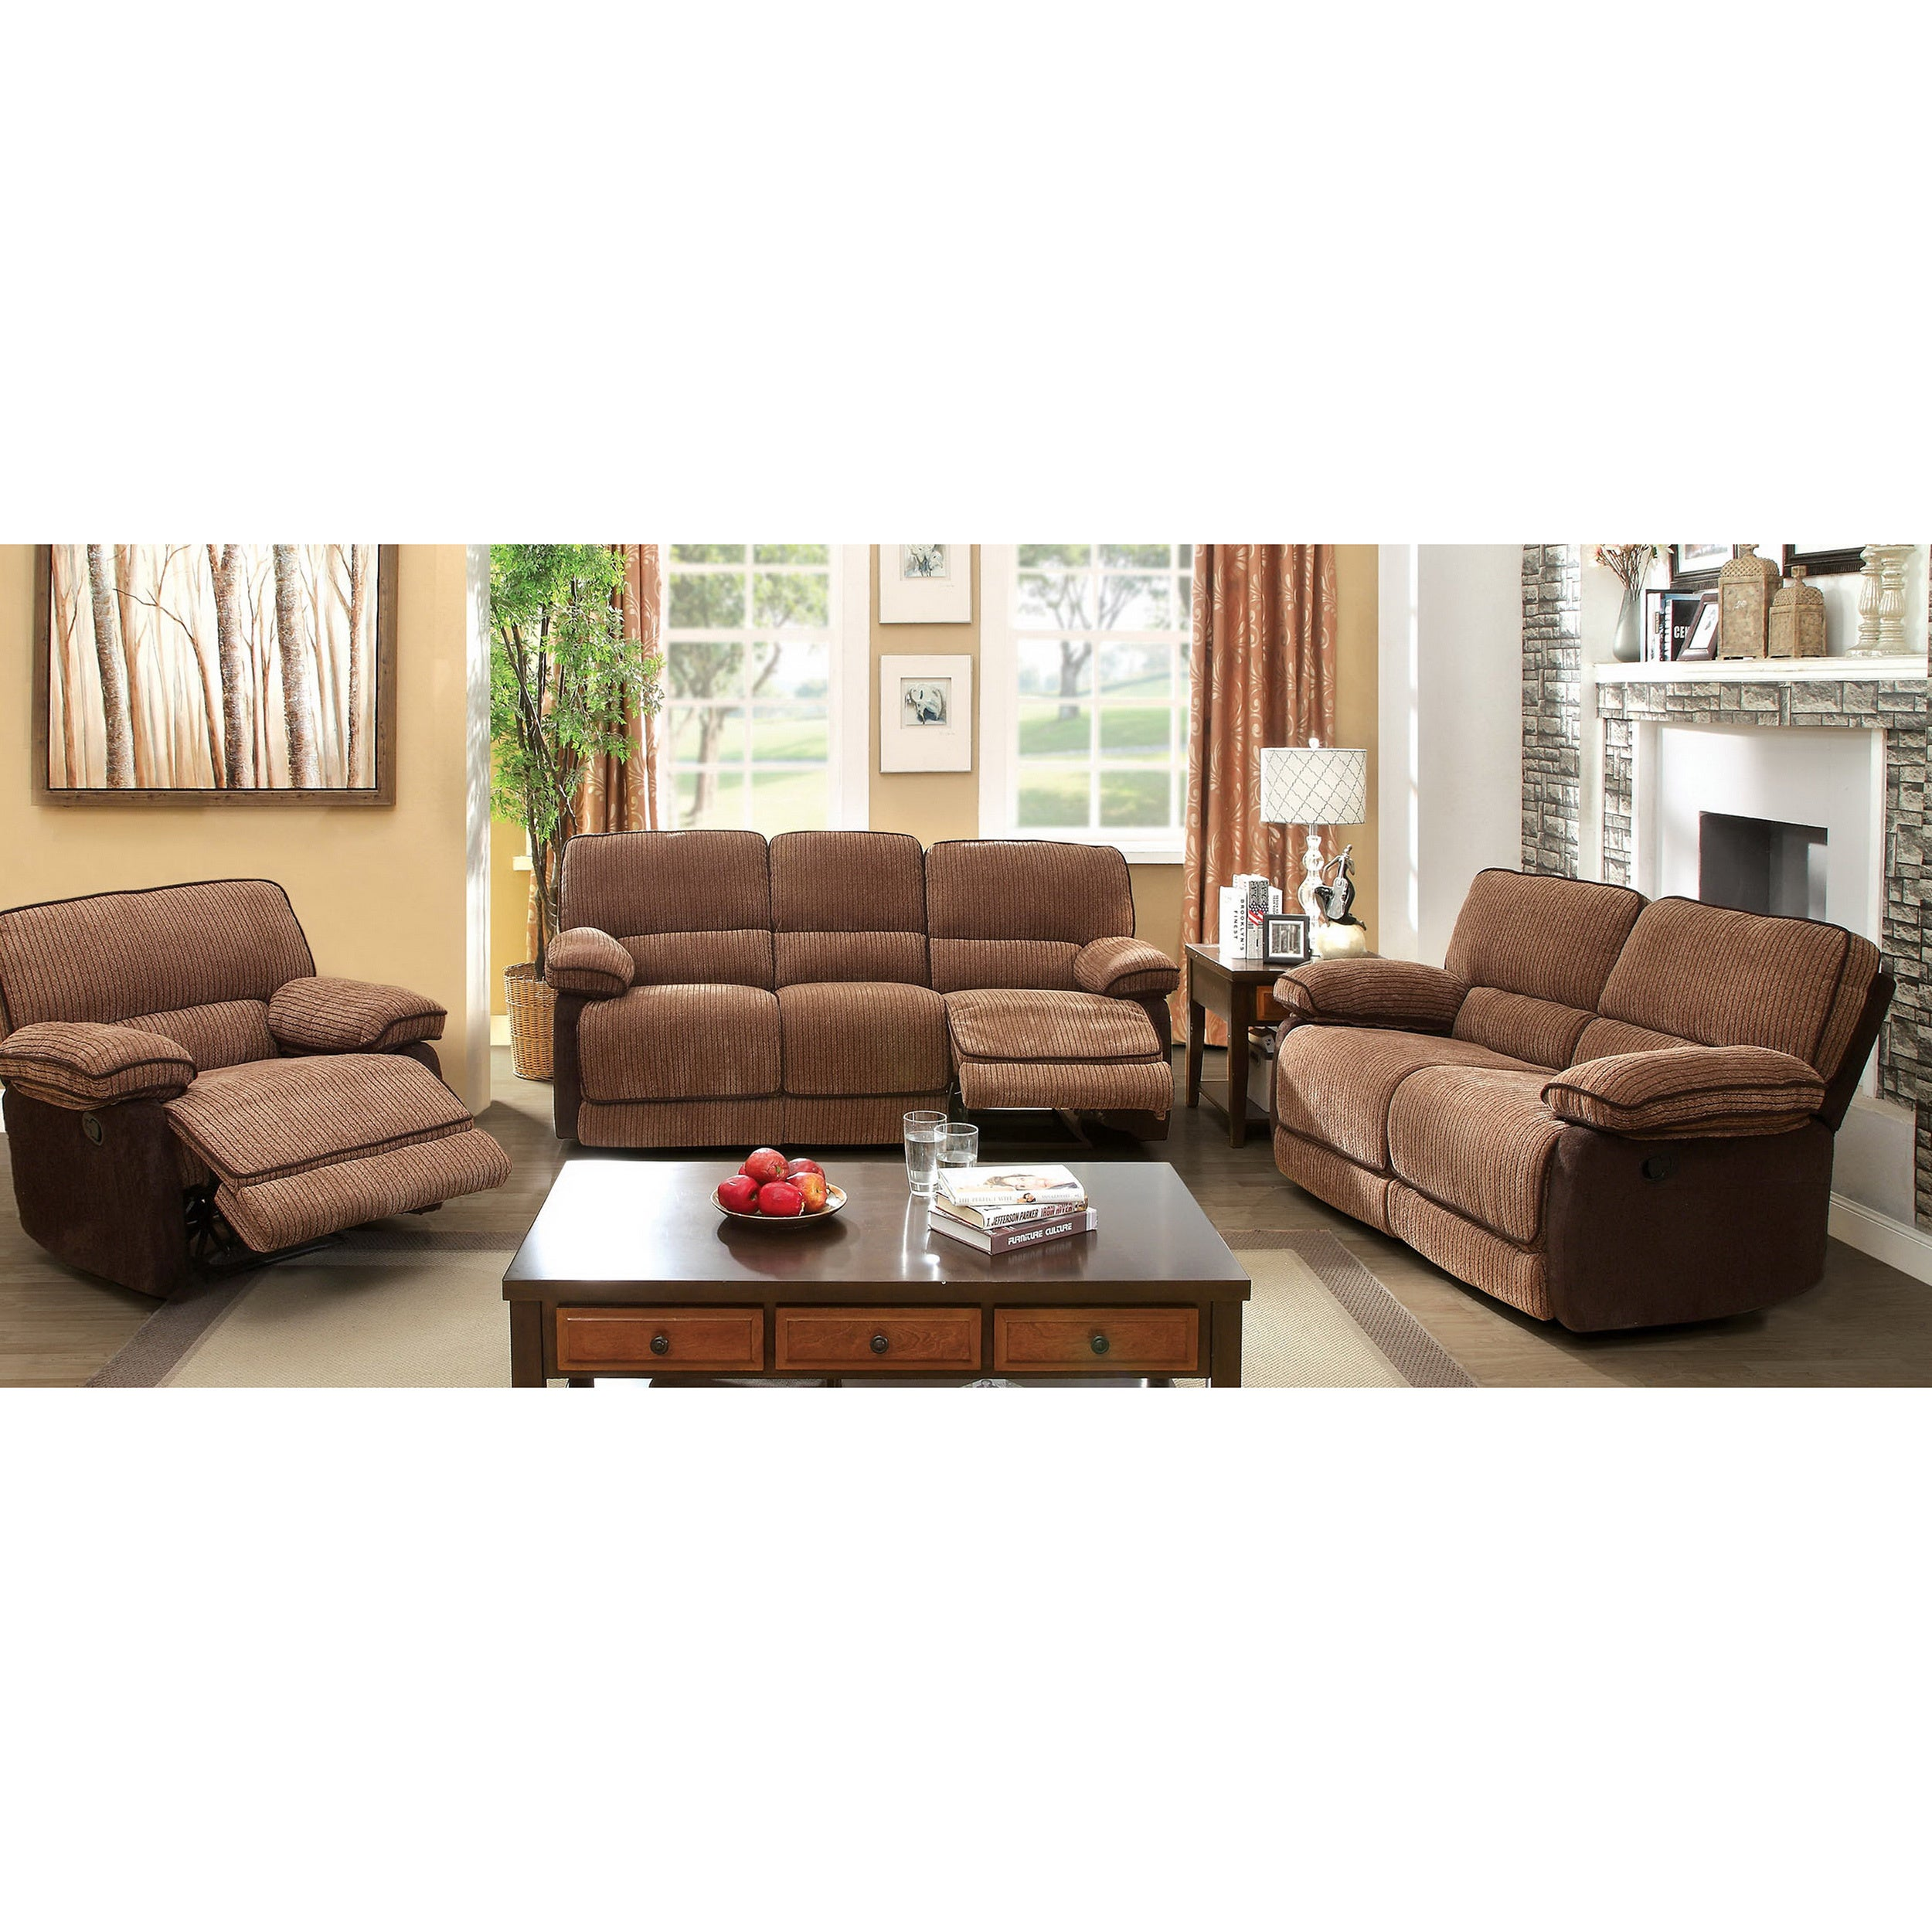 Furniture of America Dark Brown 3-piece Chenille Fabric L...